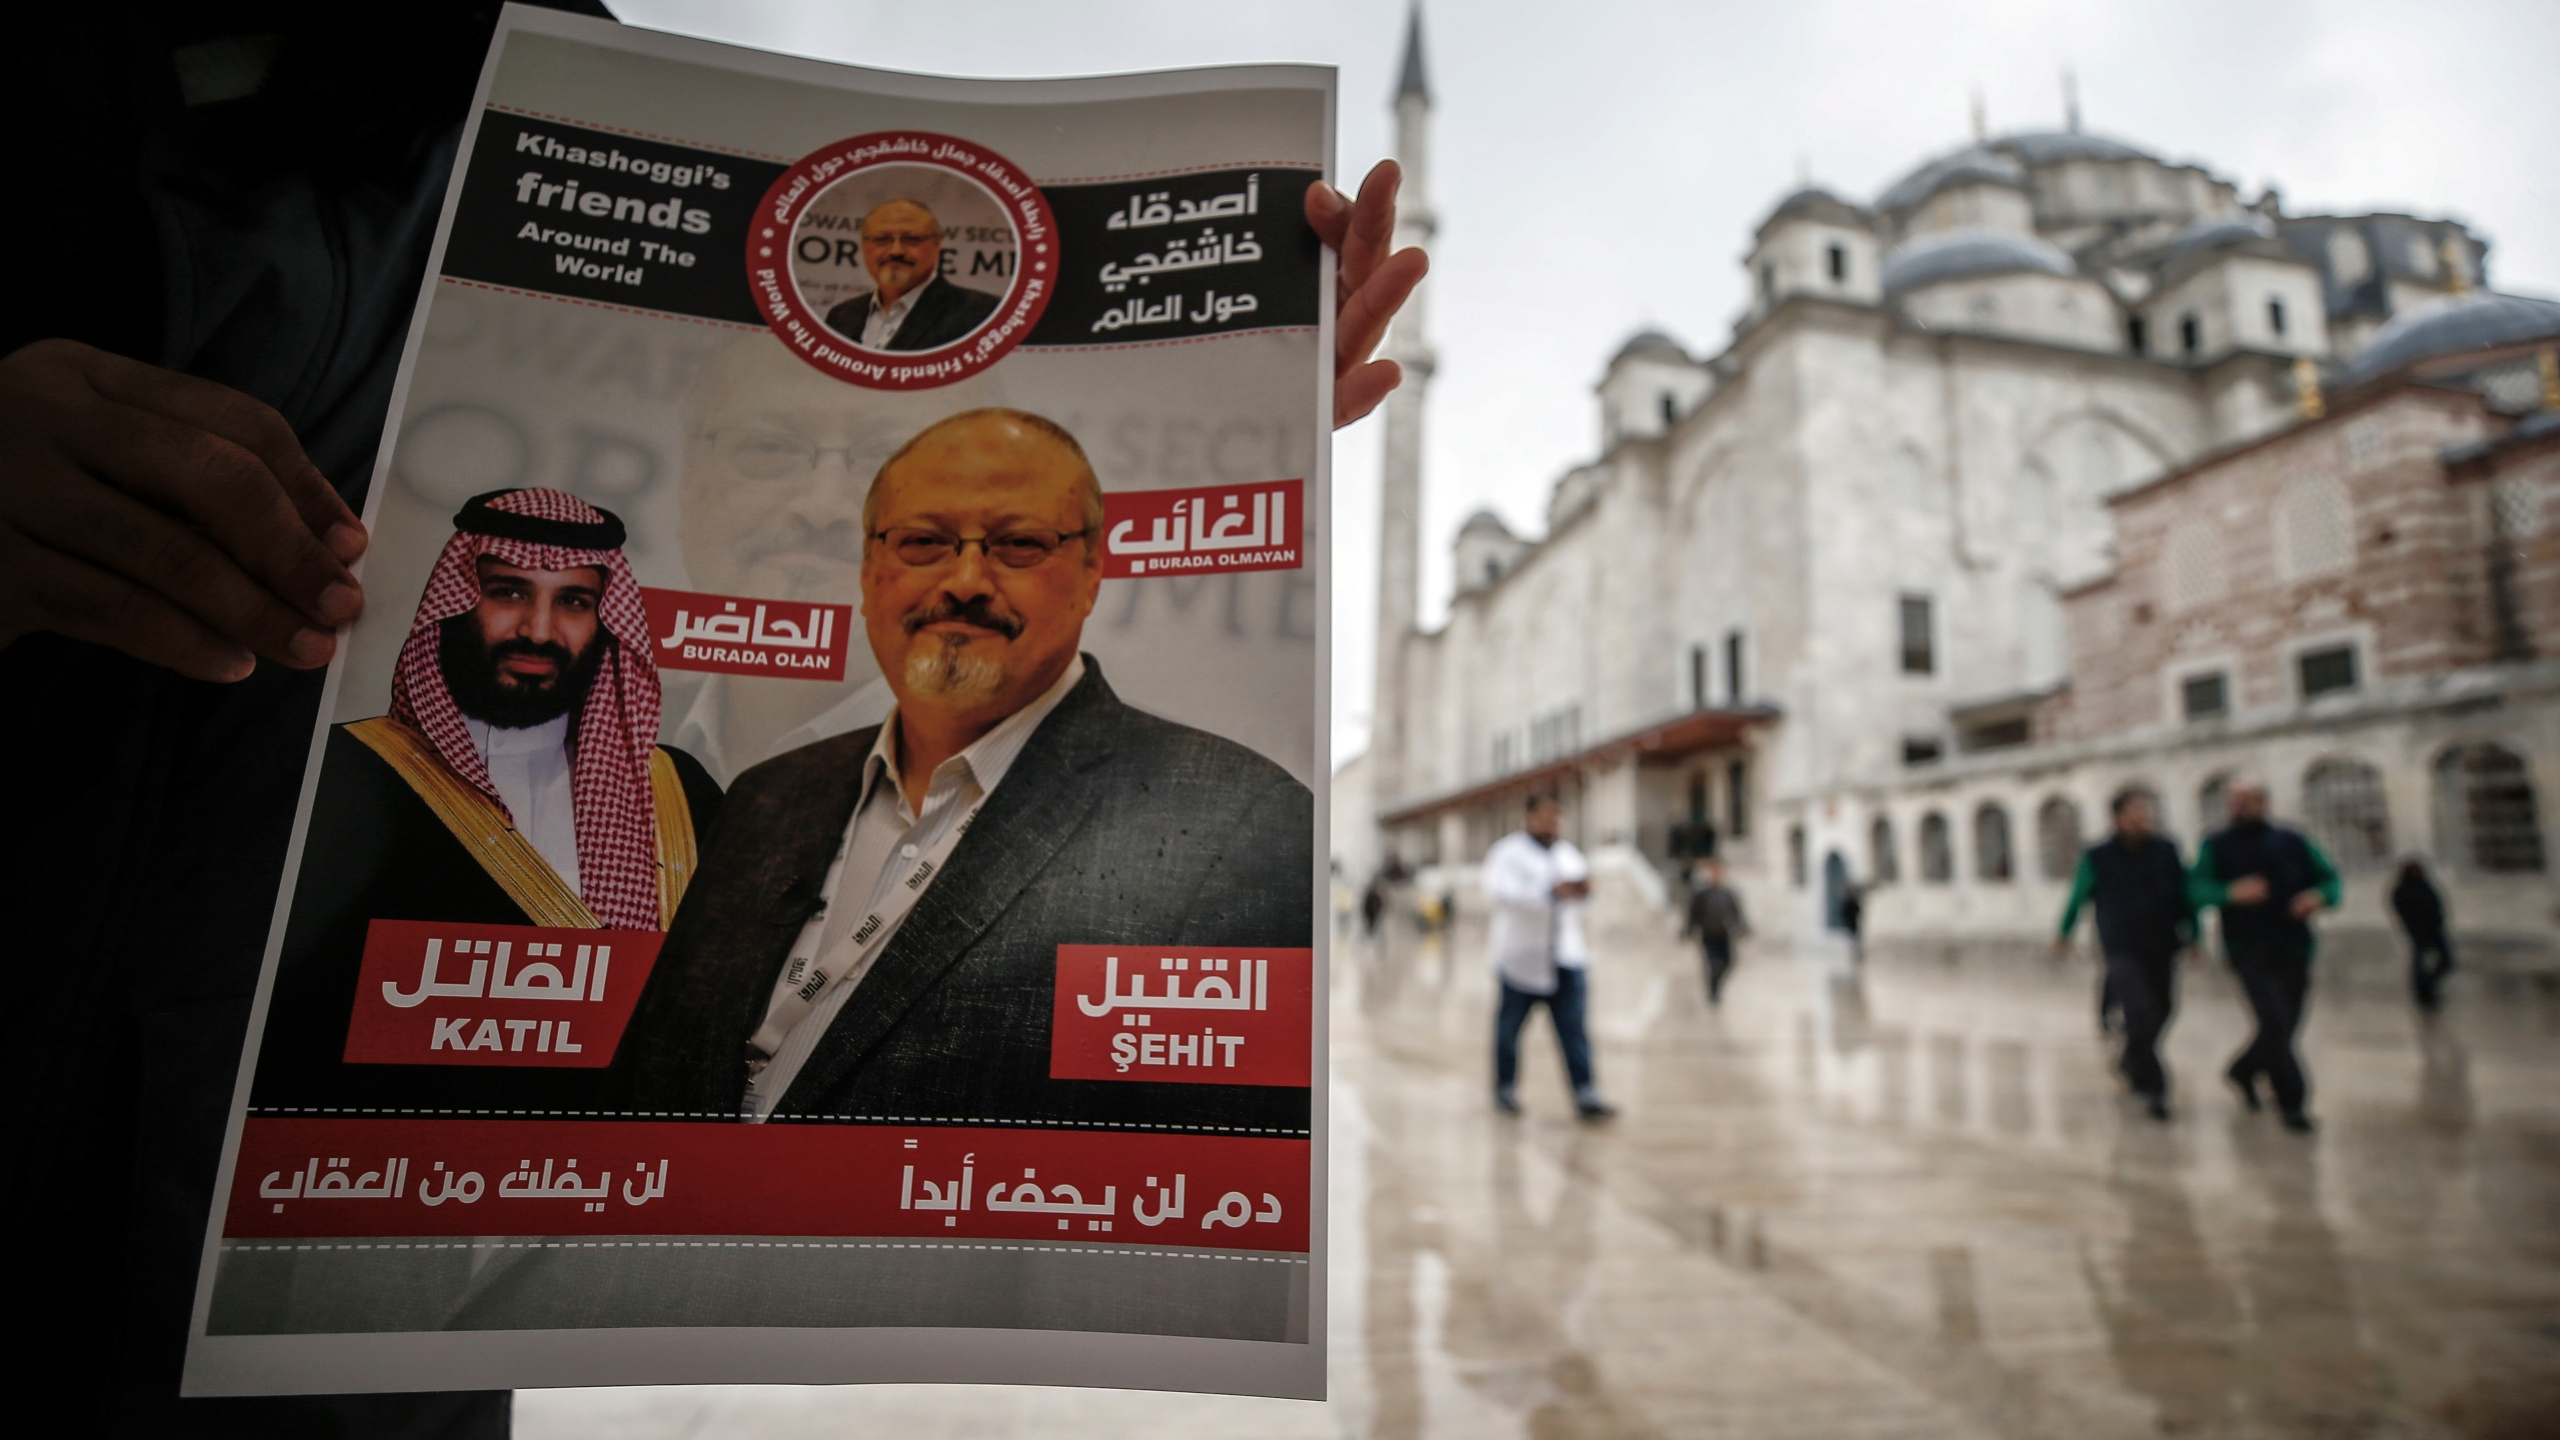 Turkey_Saudi_Arabia_Writer_Killed_88546-159532.jpg97246568